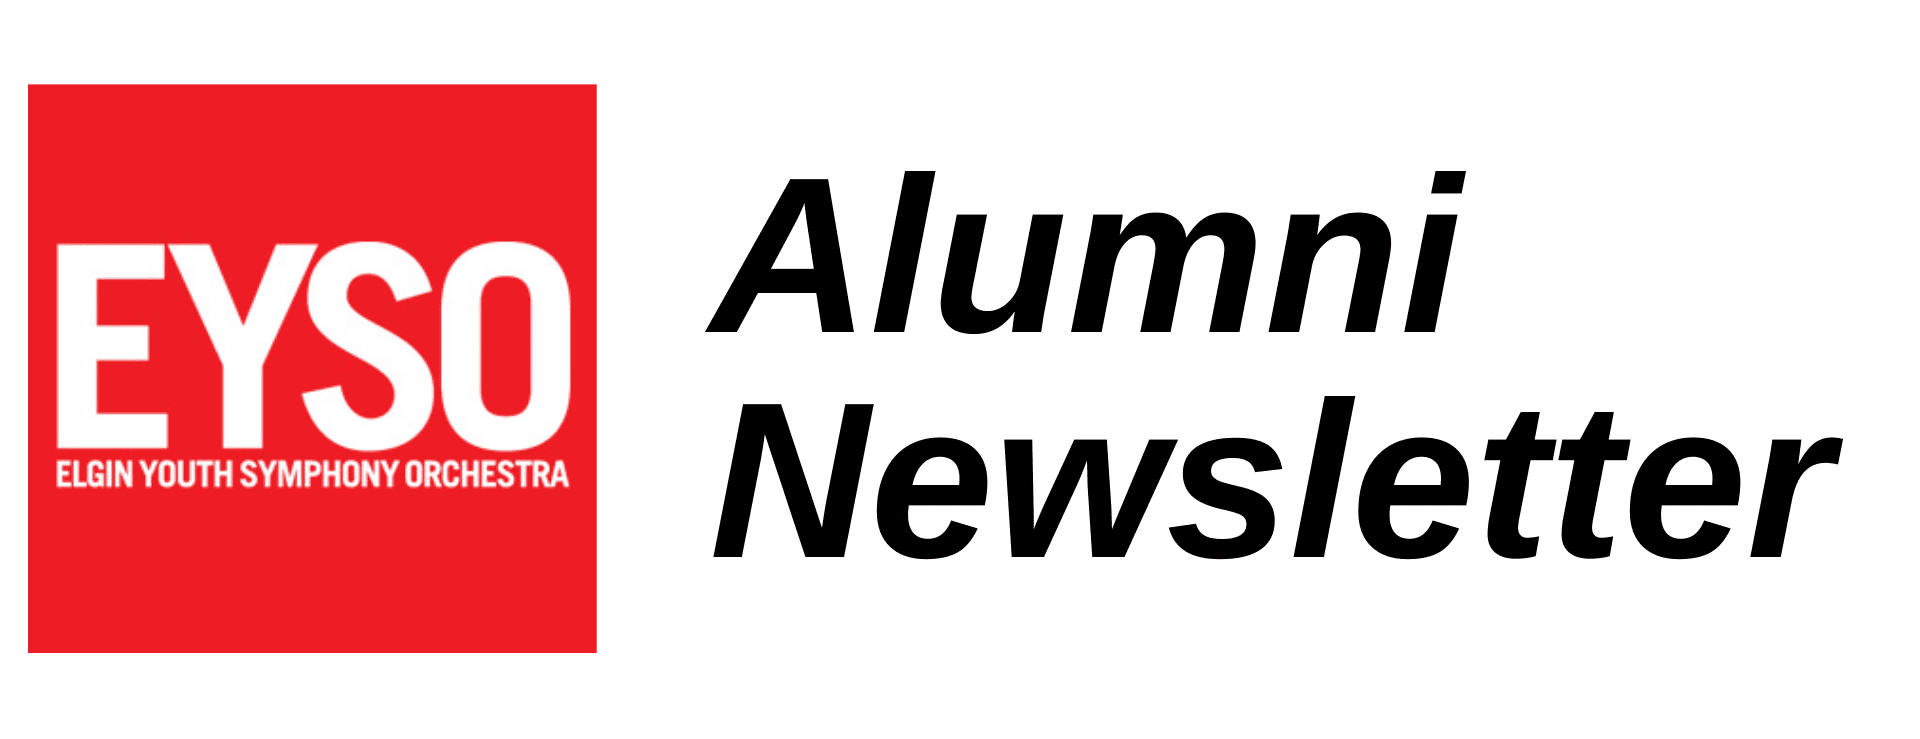 Alumni News Banner